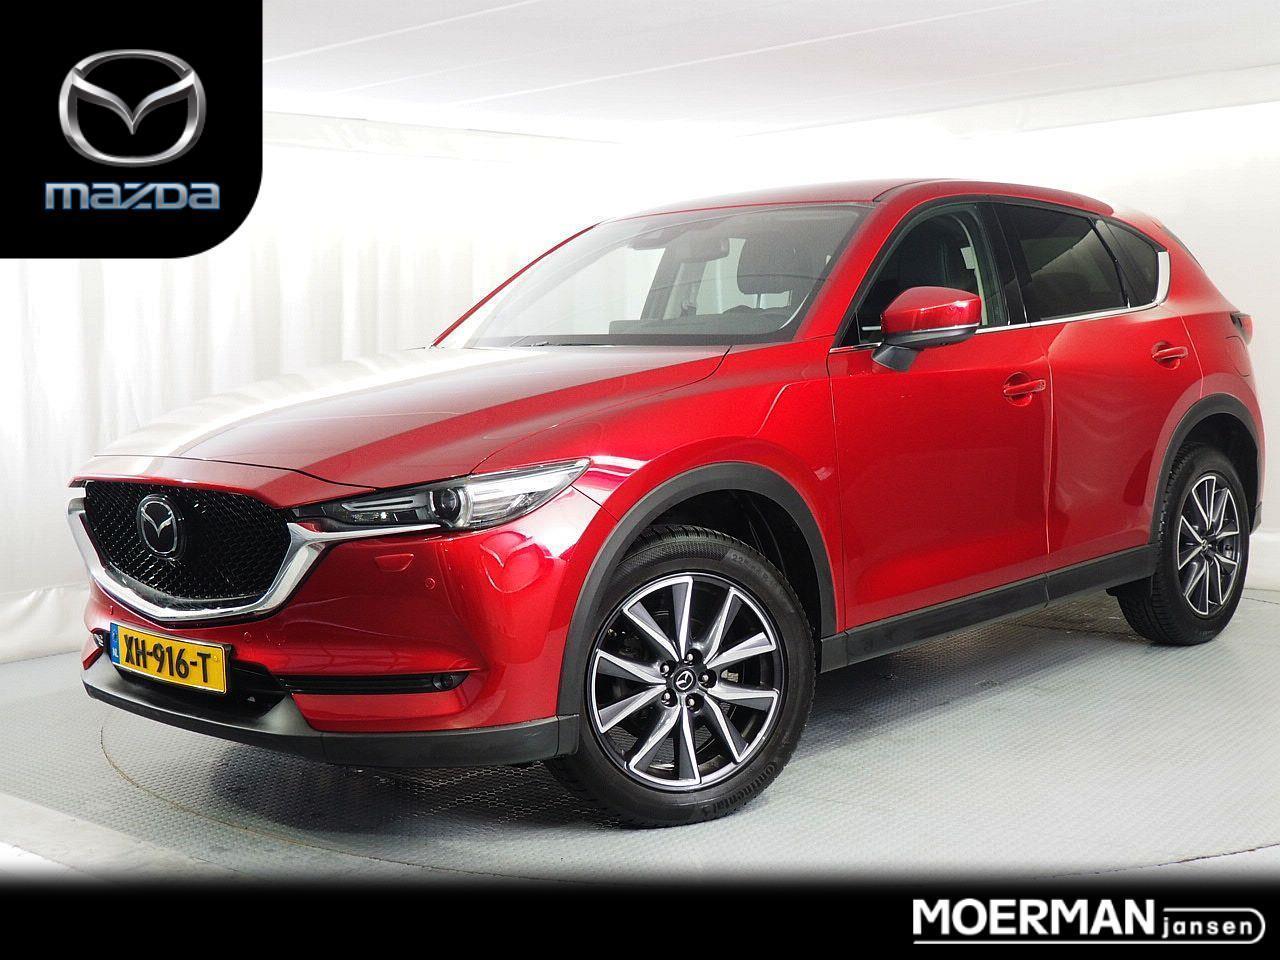 Mazda Cx-5 2.0 skyactiv-g 165 gt-m / duurste uitvoering / head-up beamer / 360 camera / radar cruise control